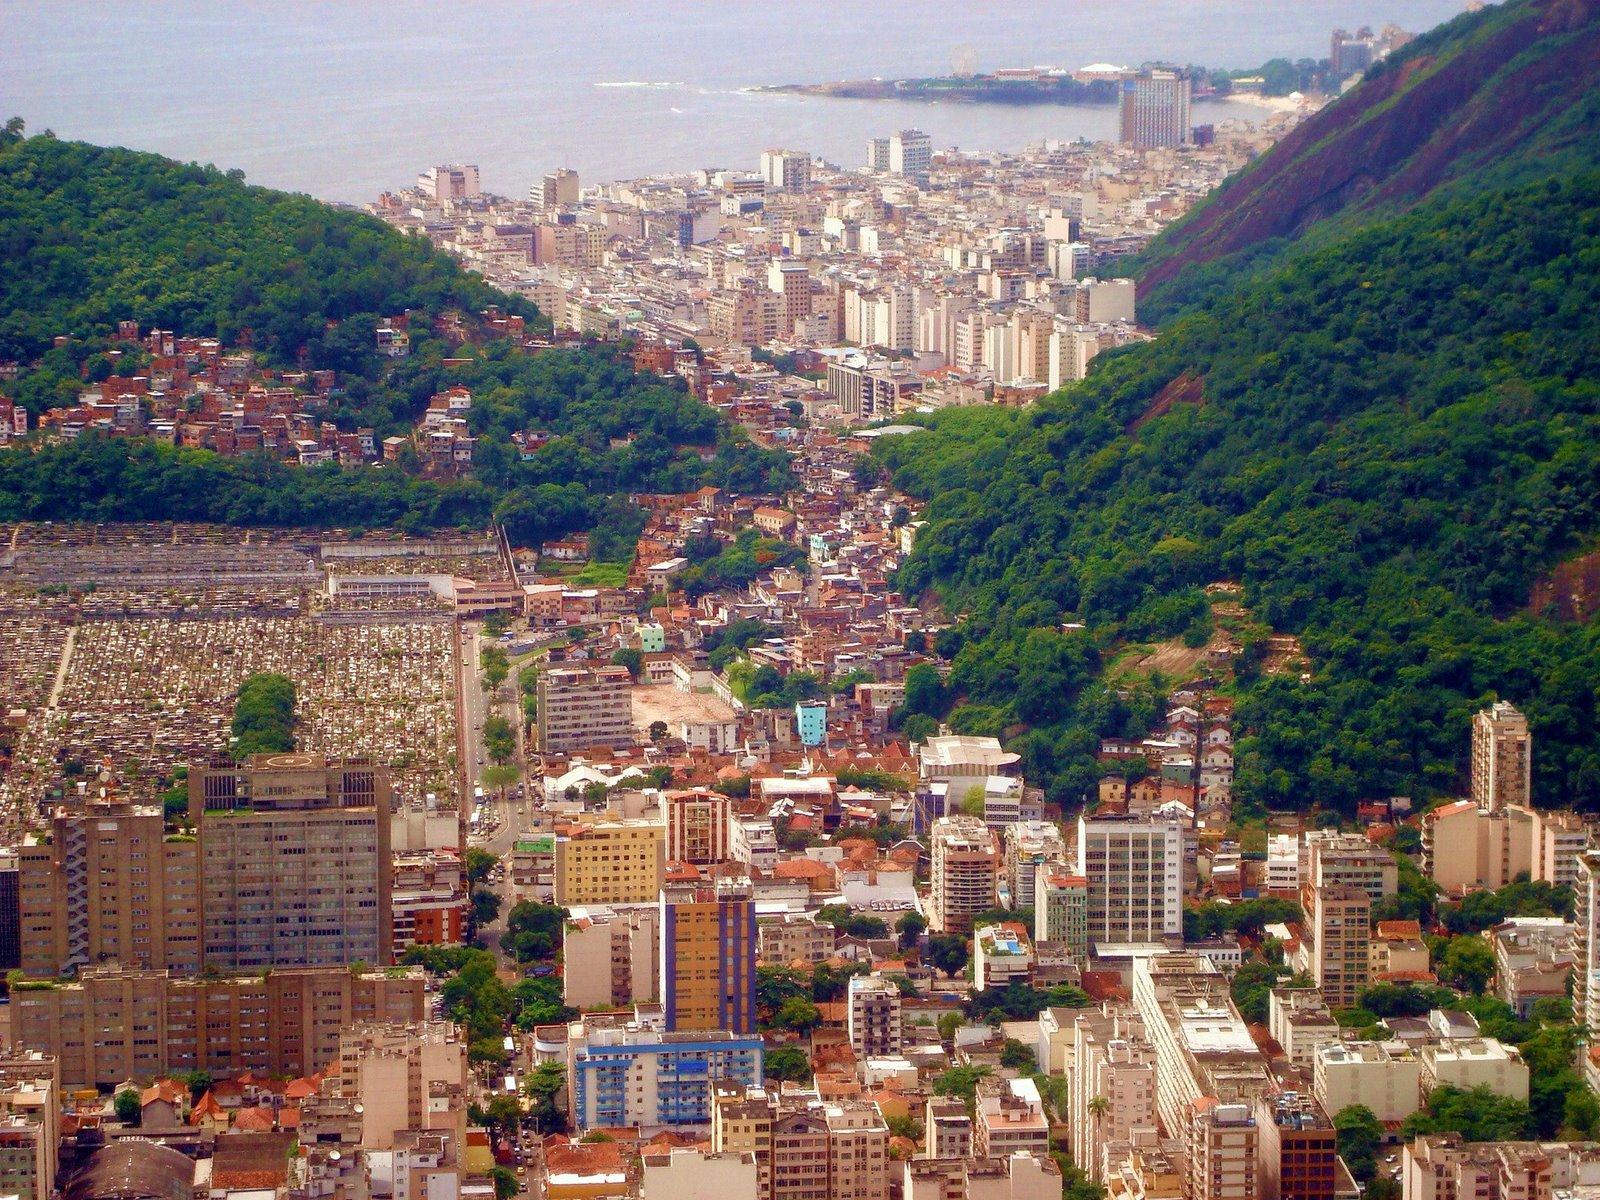 Rio de Janeiro, Brazil, City overlook